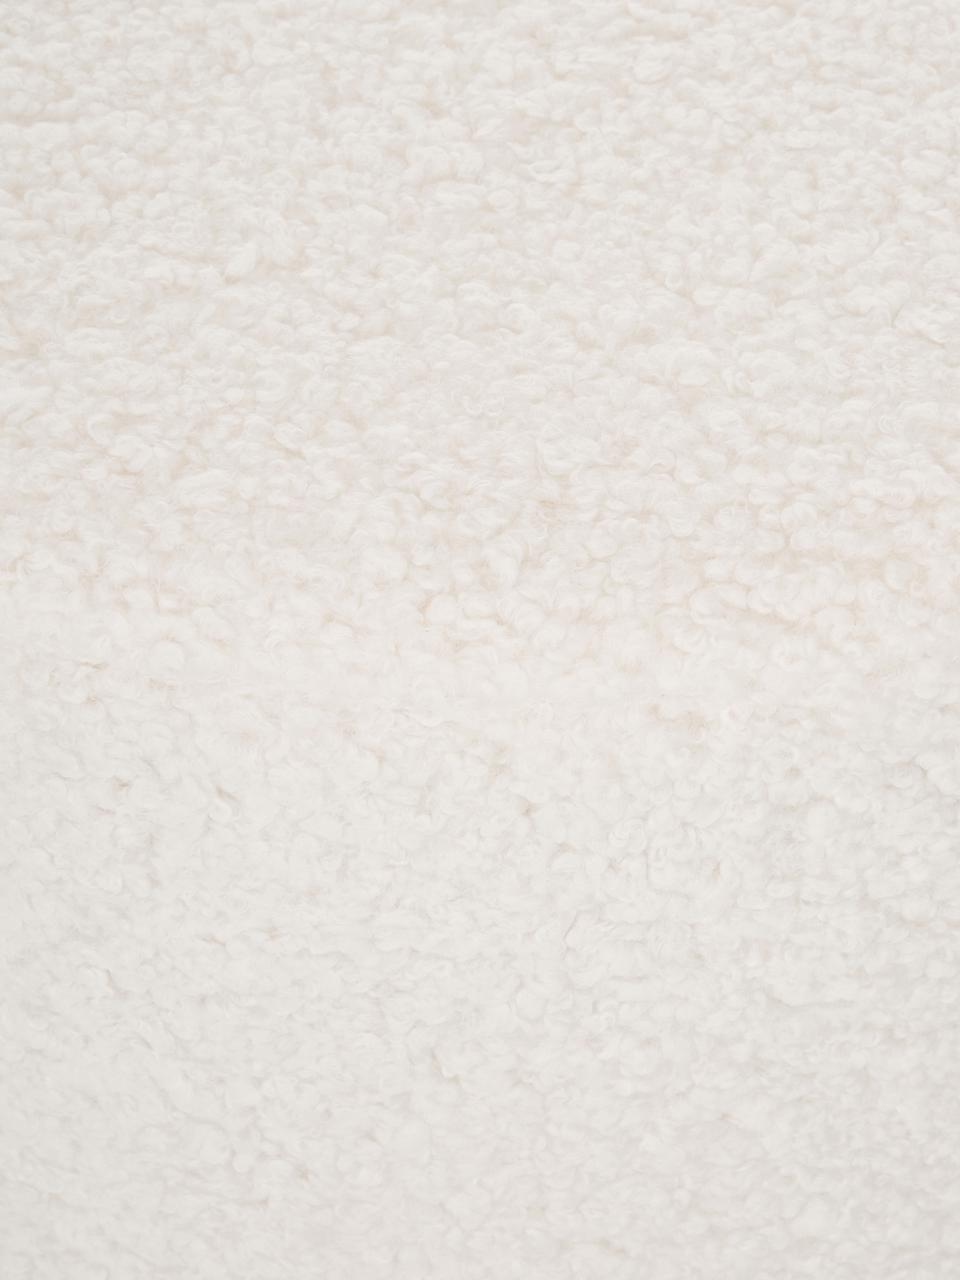 Teddy-Hocker Daisy, Bezug: Polyester (Teddyfell) 40., Rahmen: Sperrholz, Teddy Cremeweiß, Ø 54 x H 38 cm